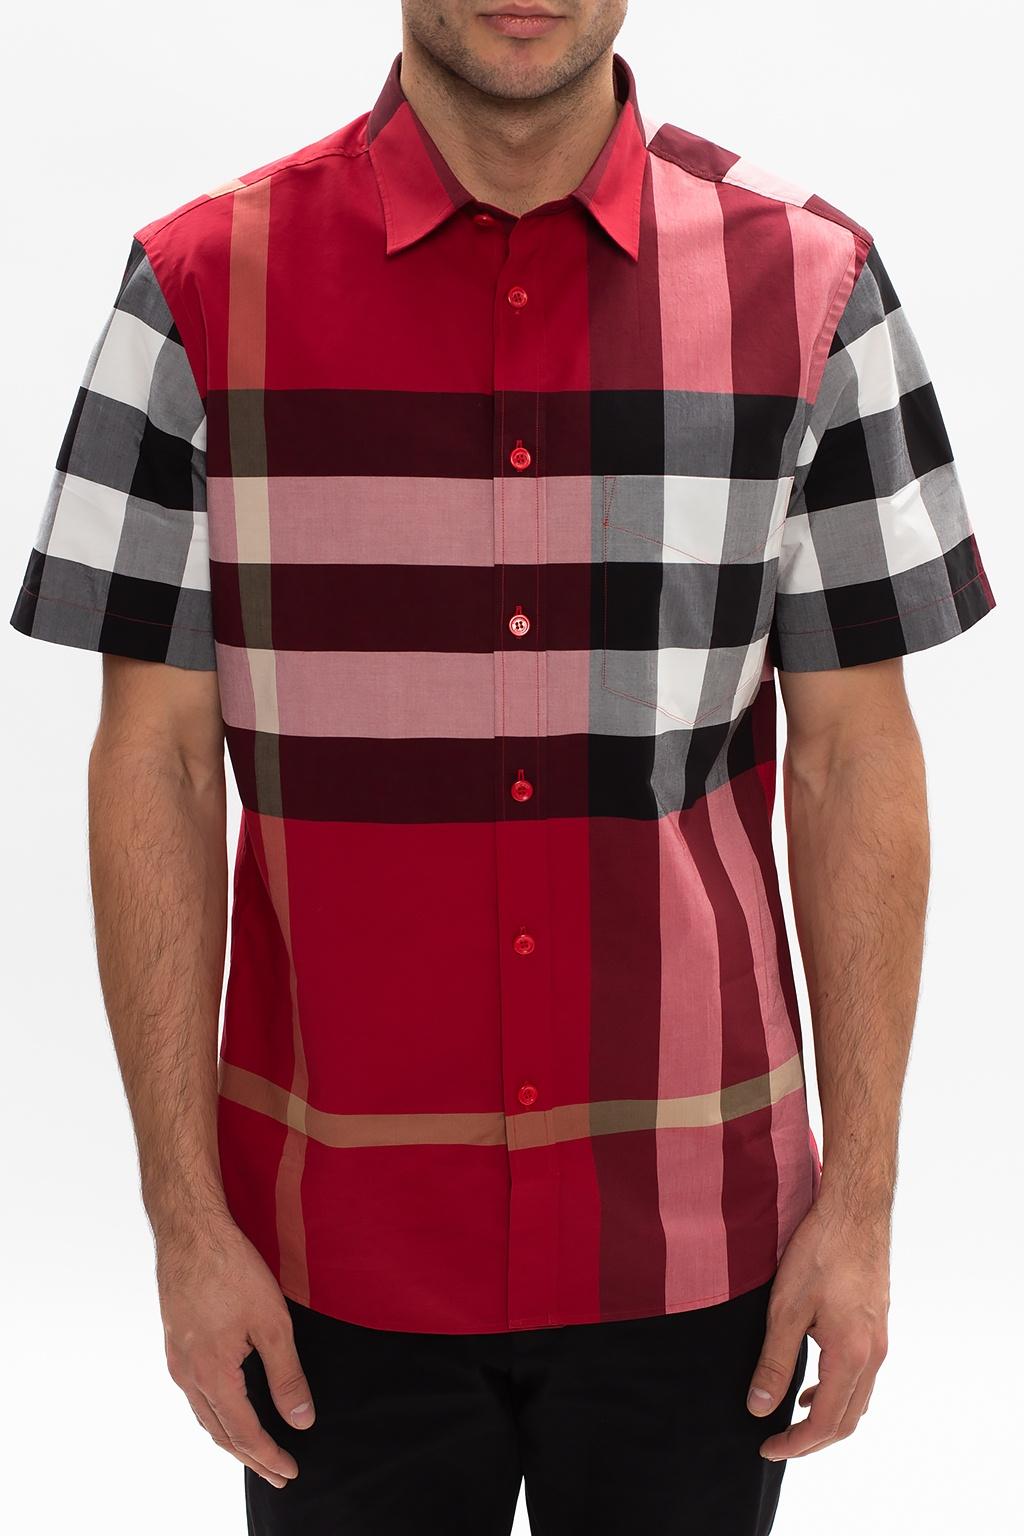 Burberry Short-sleeved check shirt